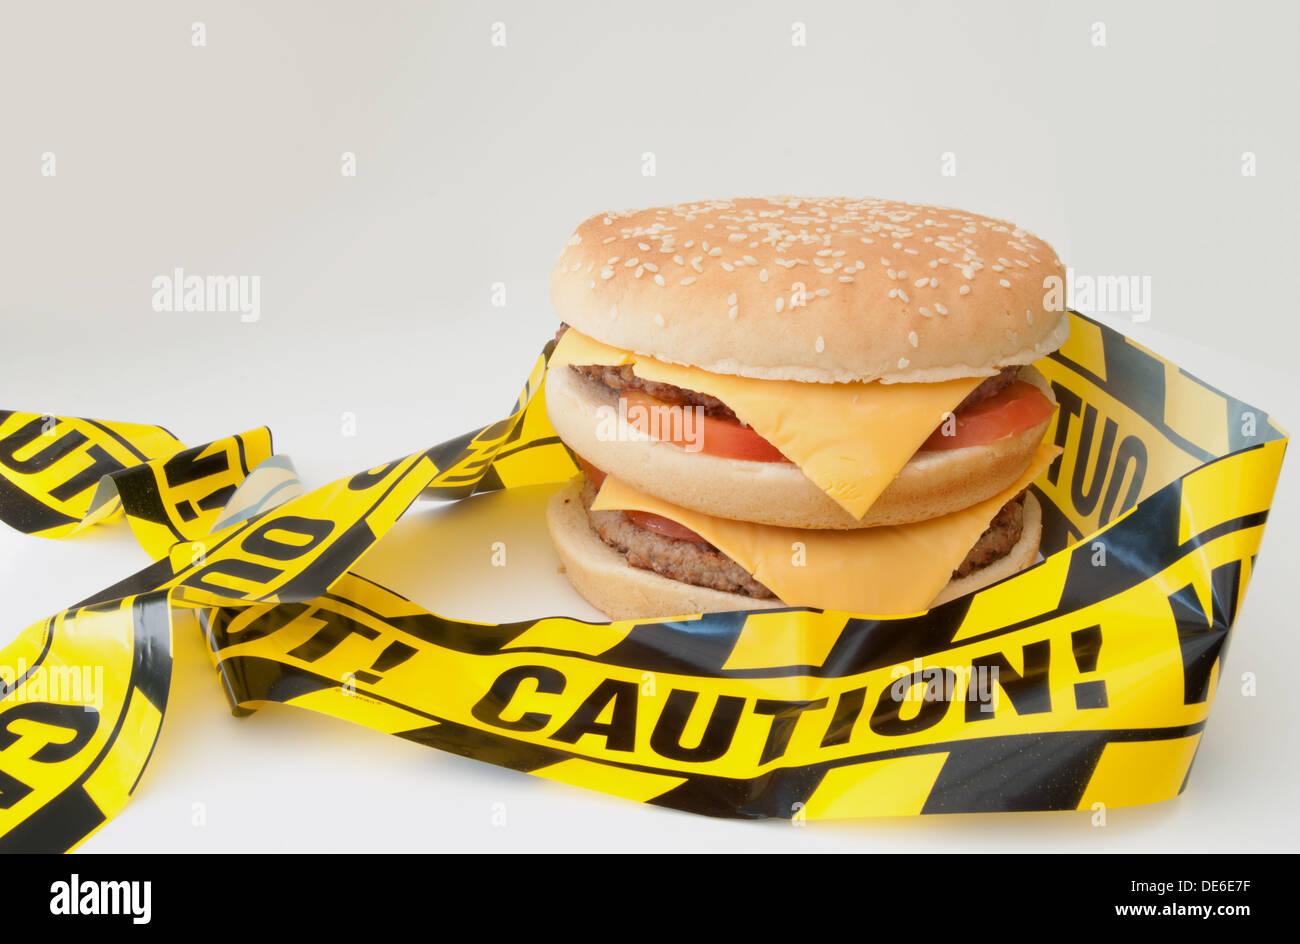 Unhealthy food warning - Stock Image